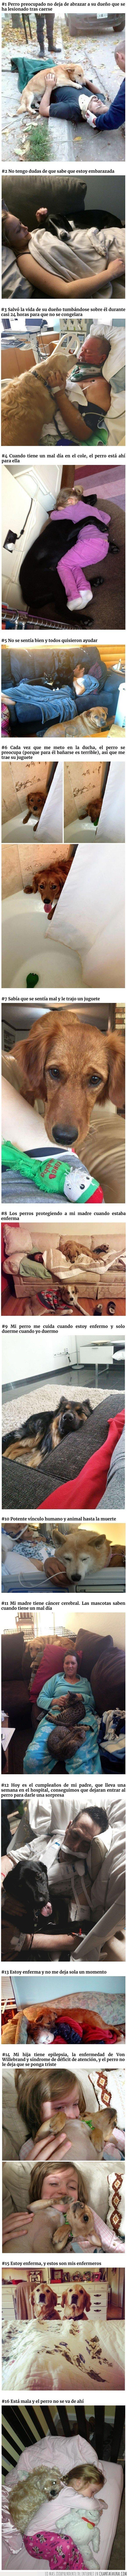 amor,mascotas,perros